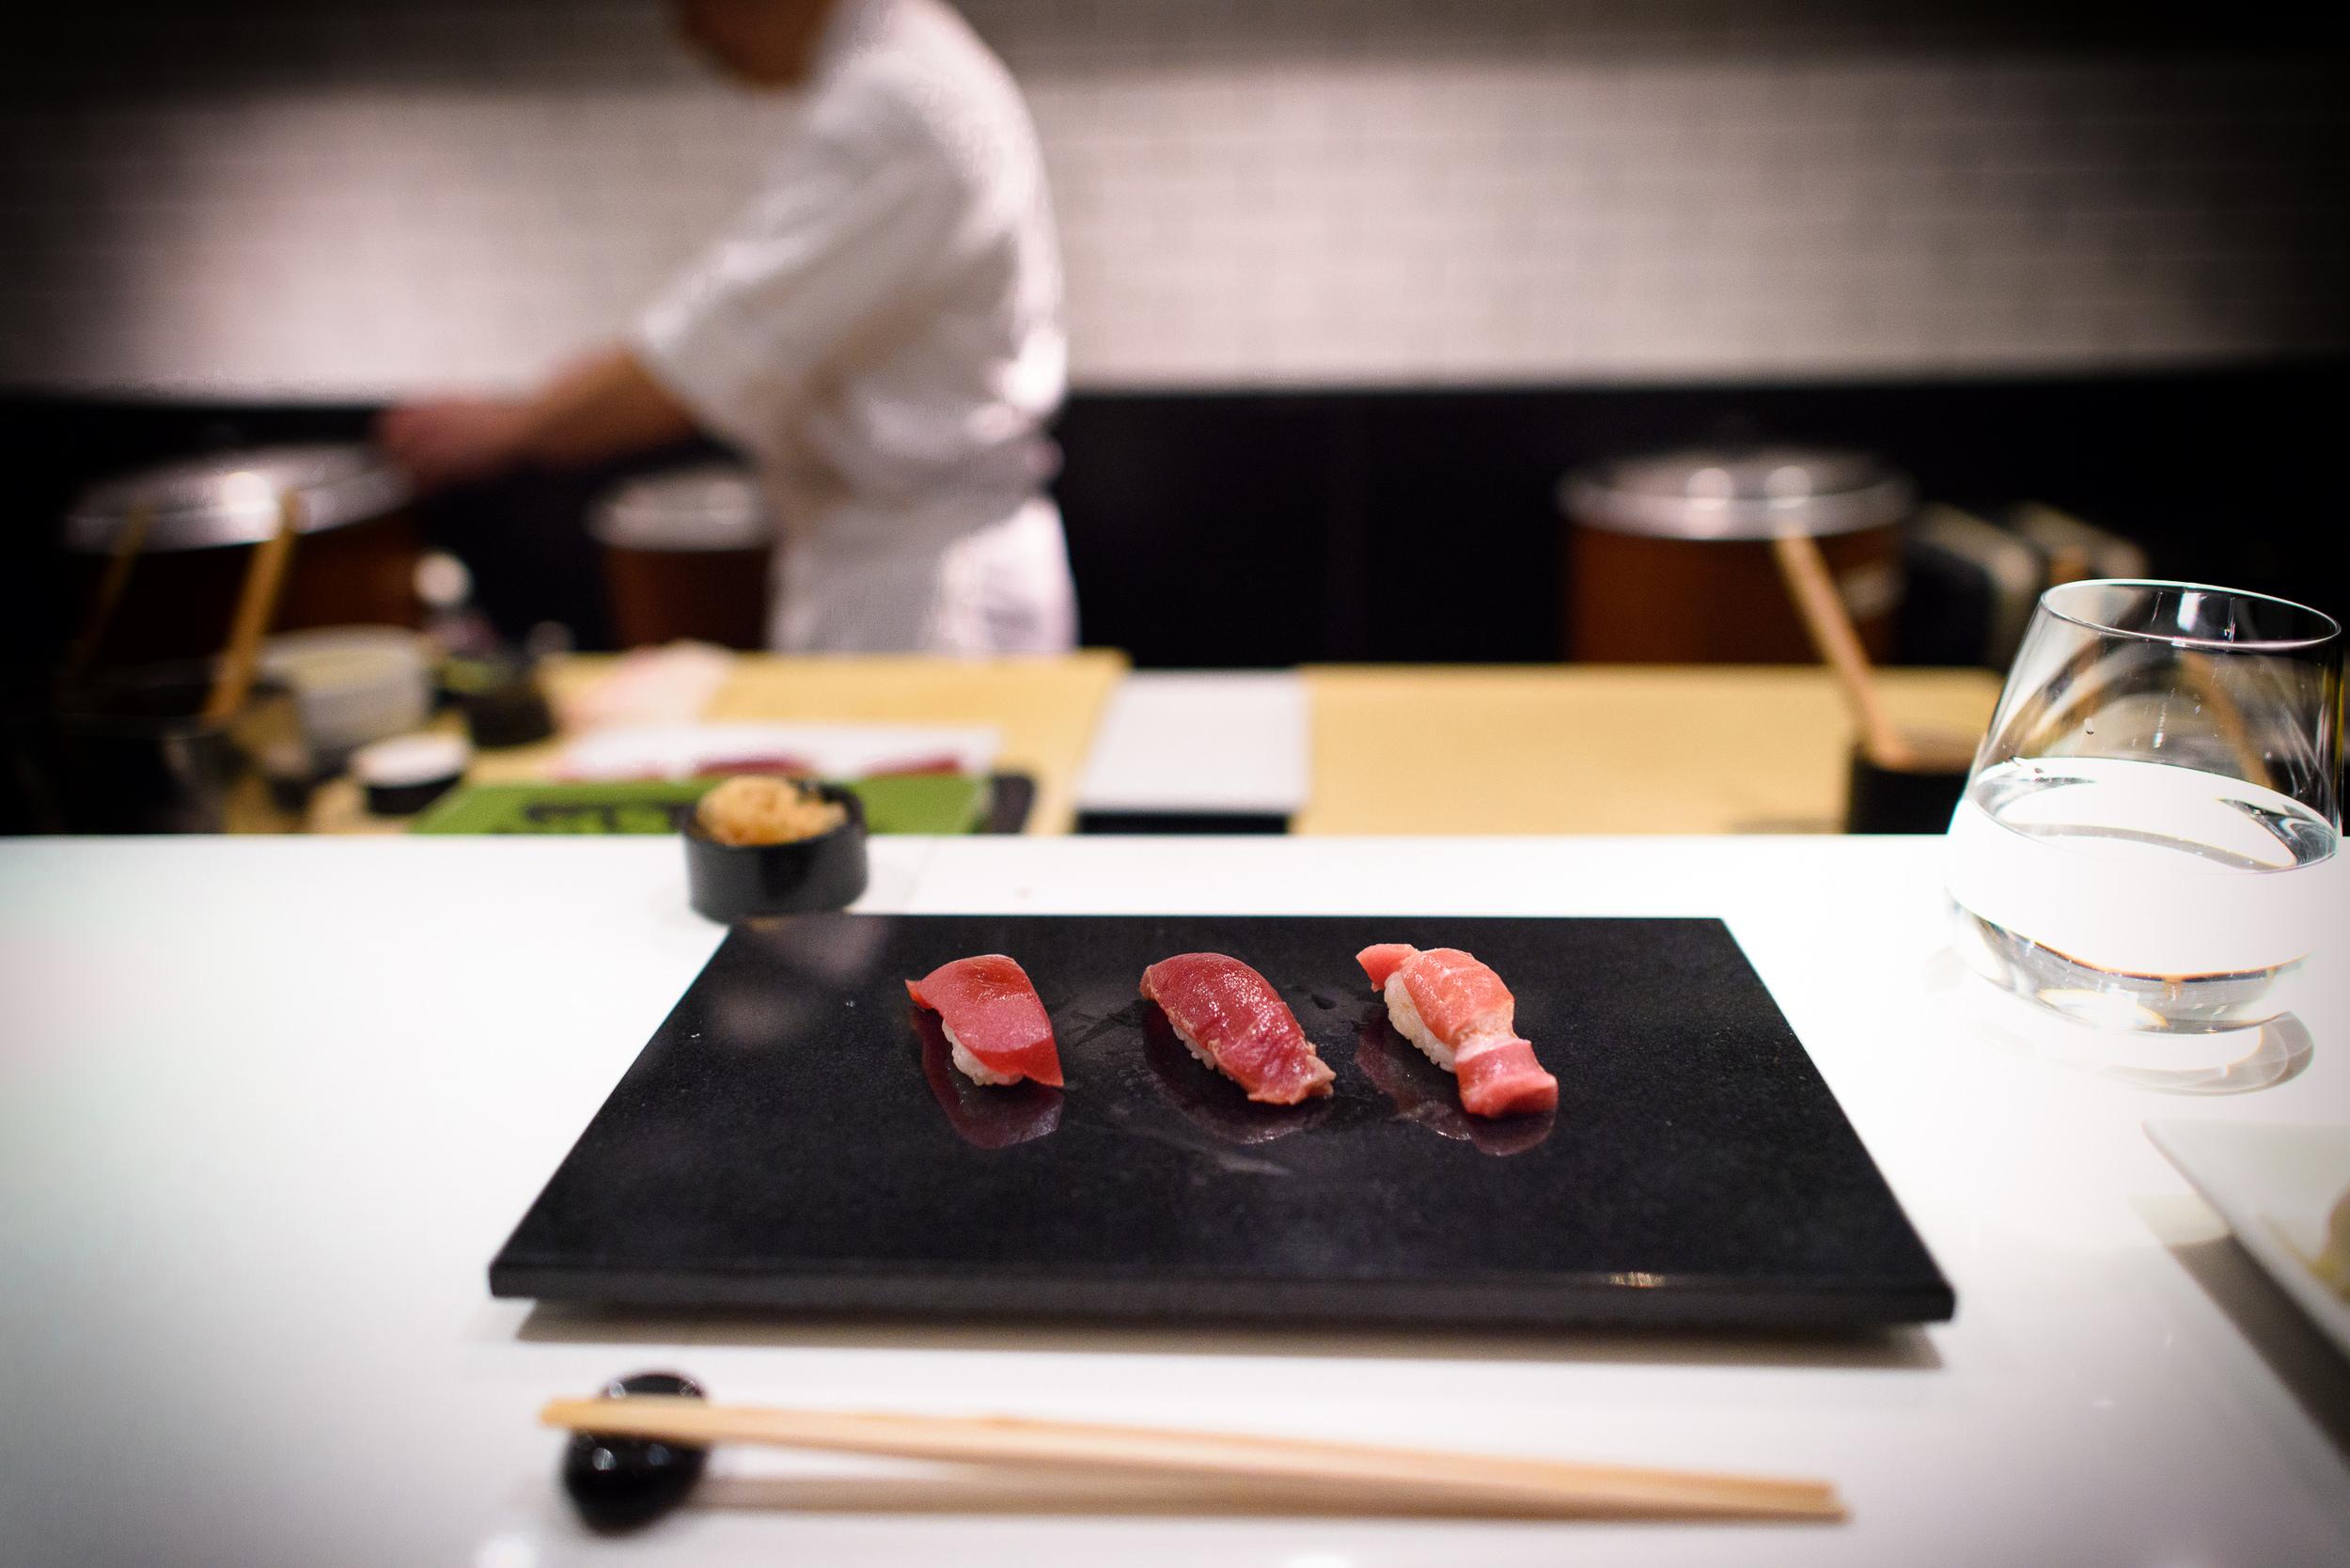 14th, 15th and 16th Courses: Tuna (lean tuna, soy-marinated tuna